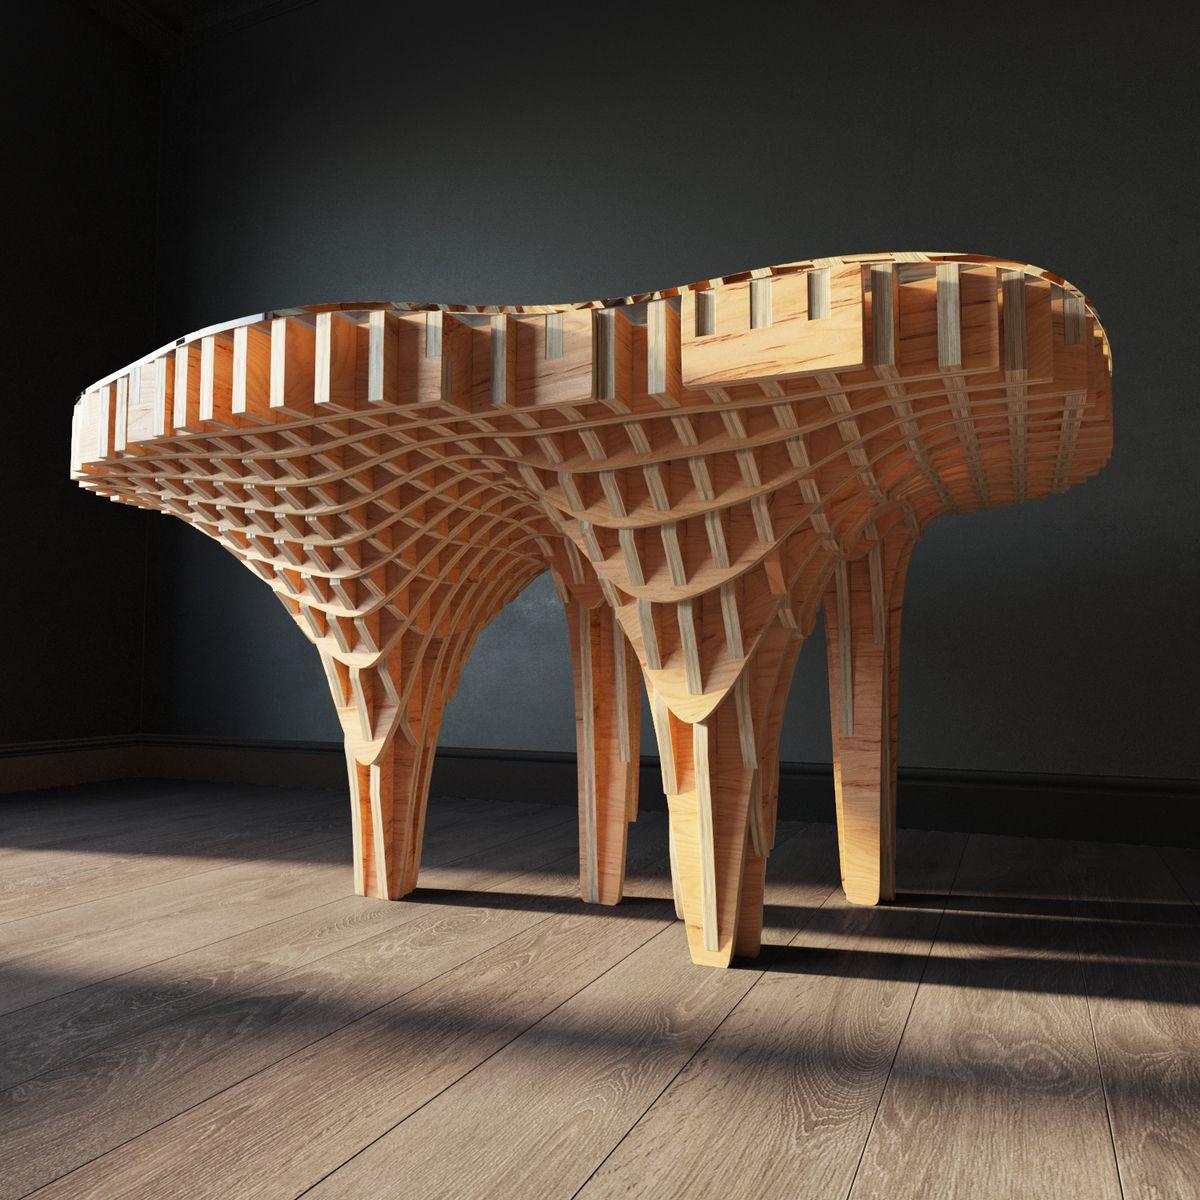 3d Model Parametric Table Mushroom Interior Furniture 3d